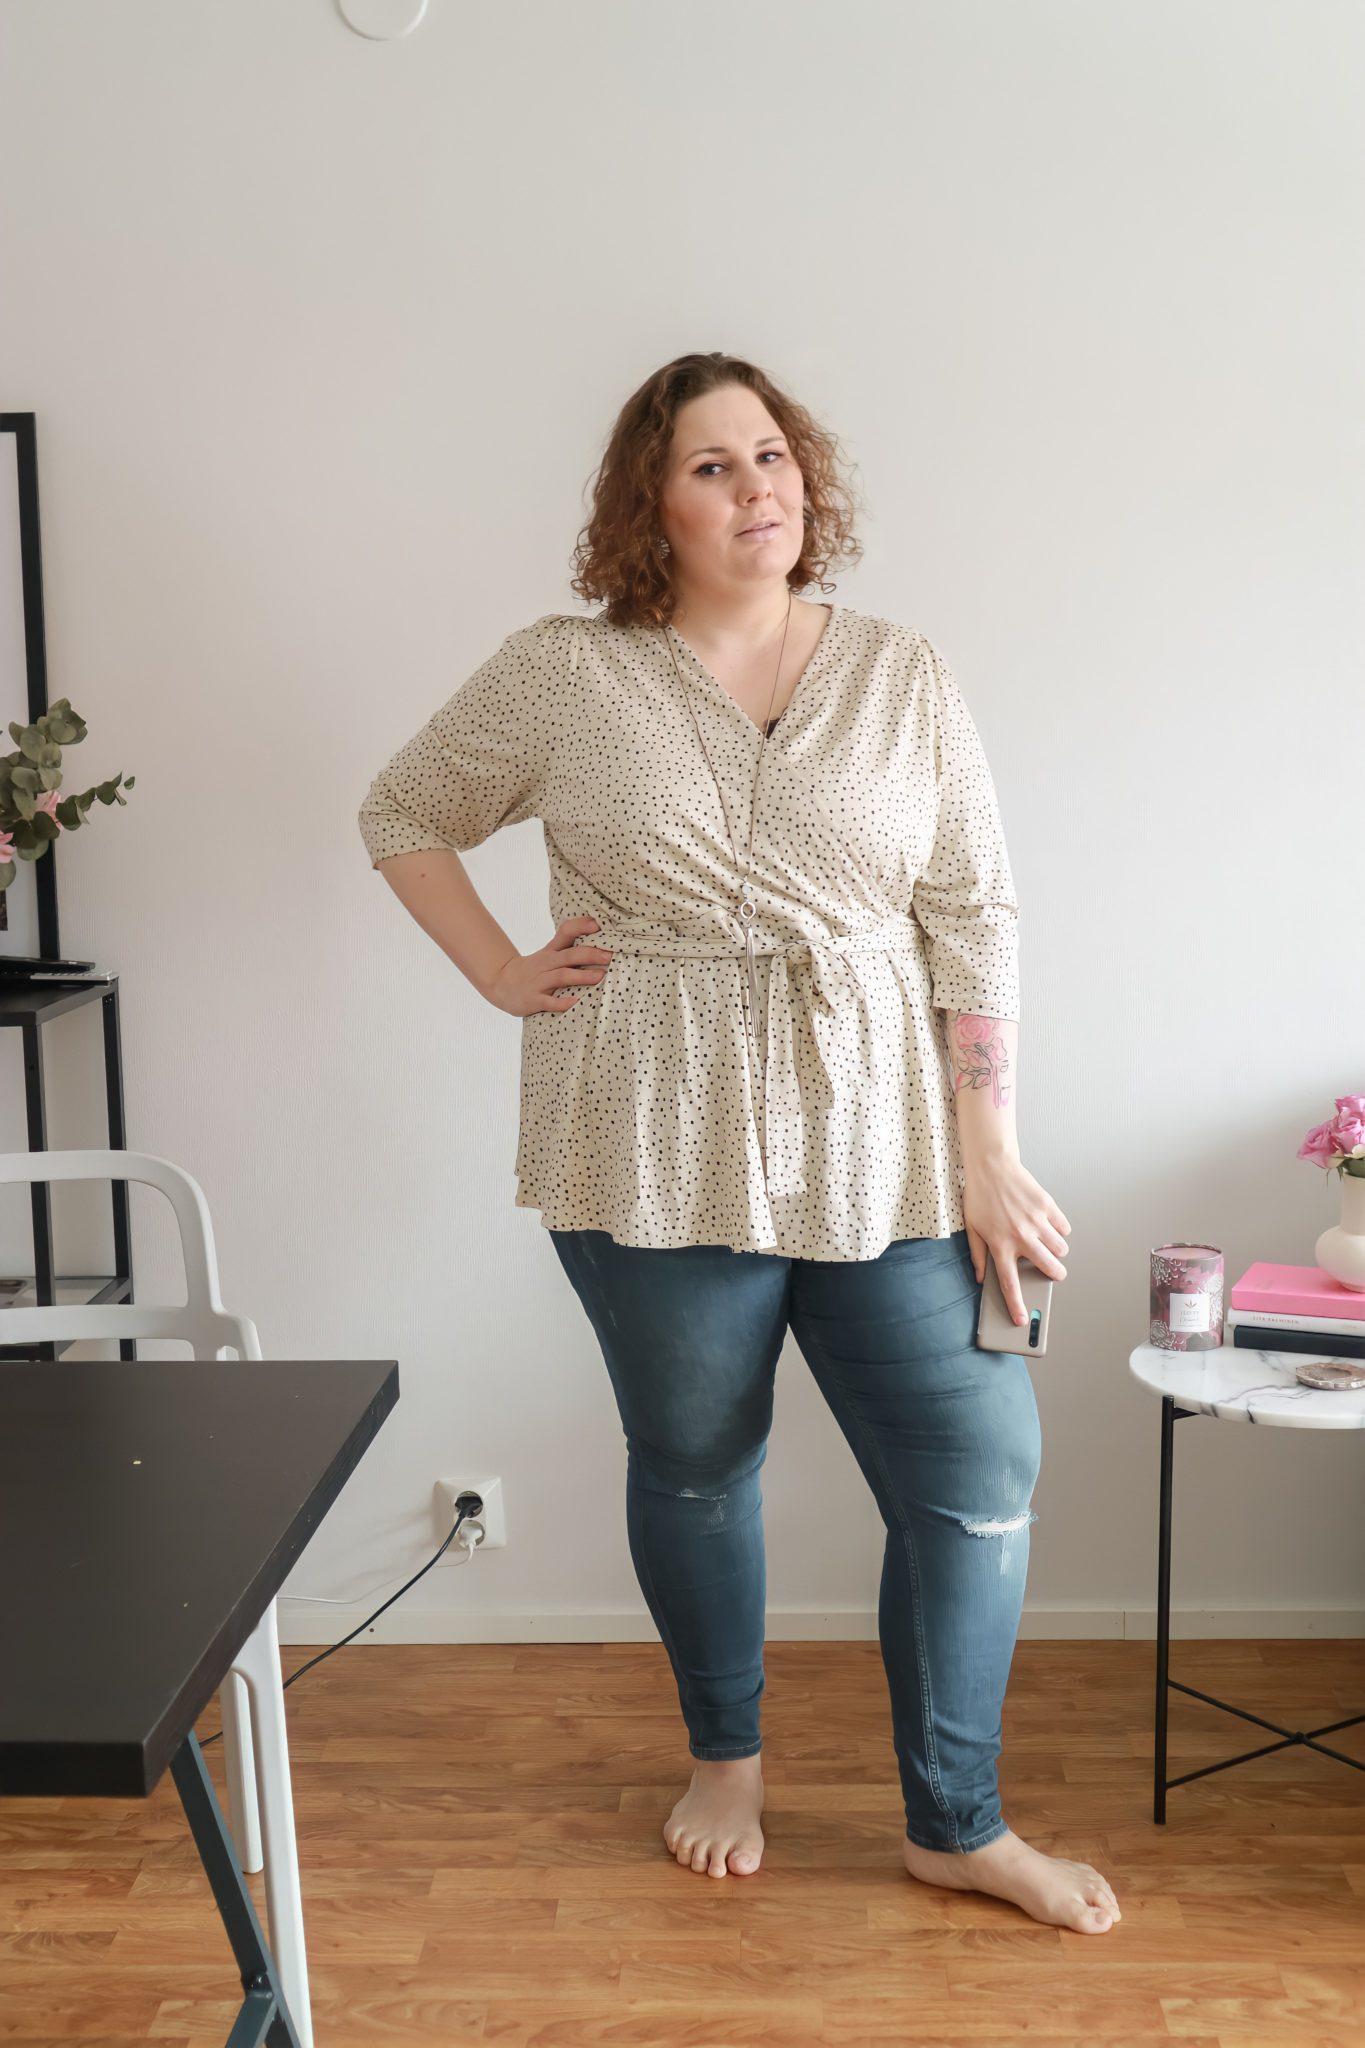 Tammikuun hankinnat - Big mamas home by Jenni